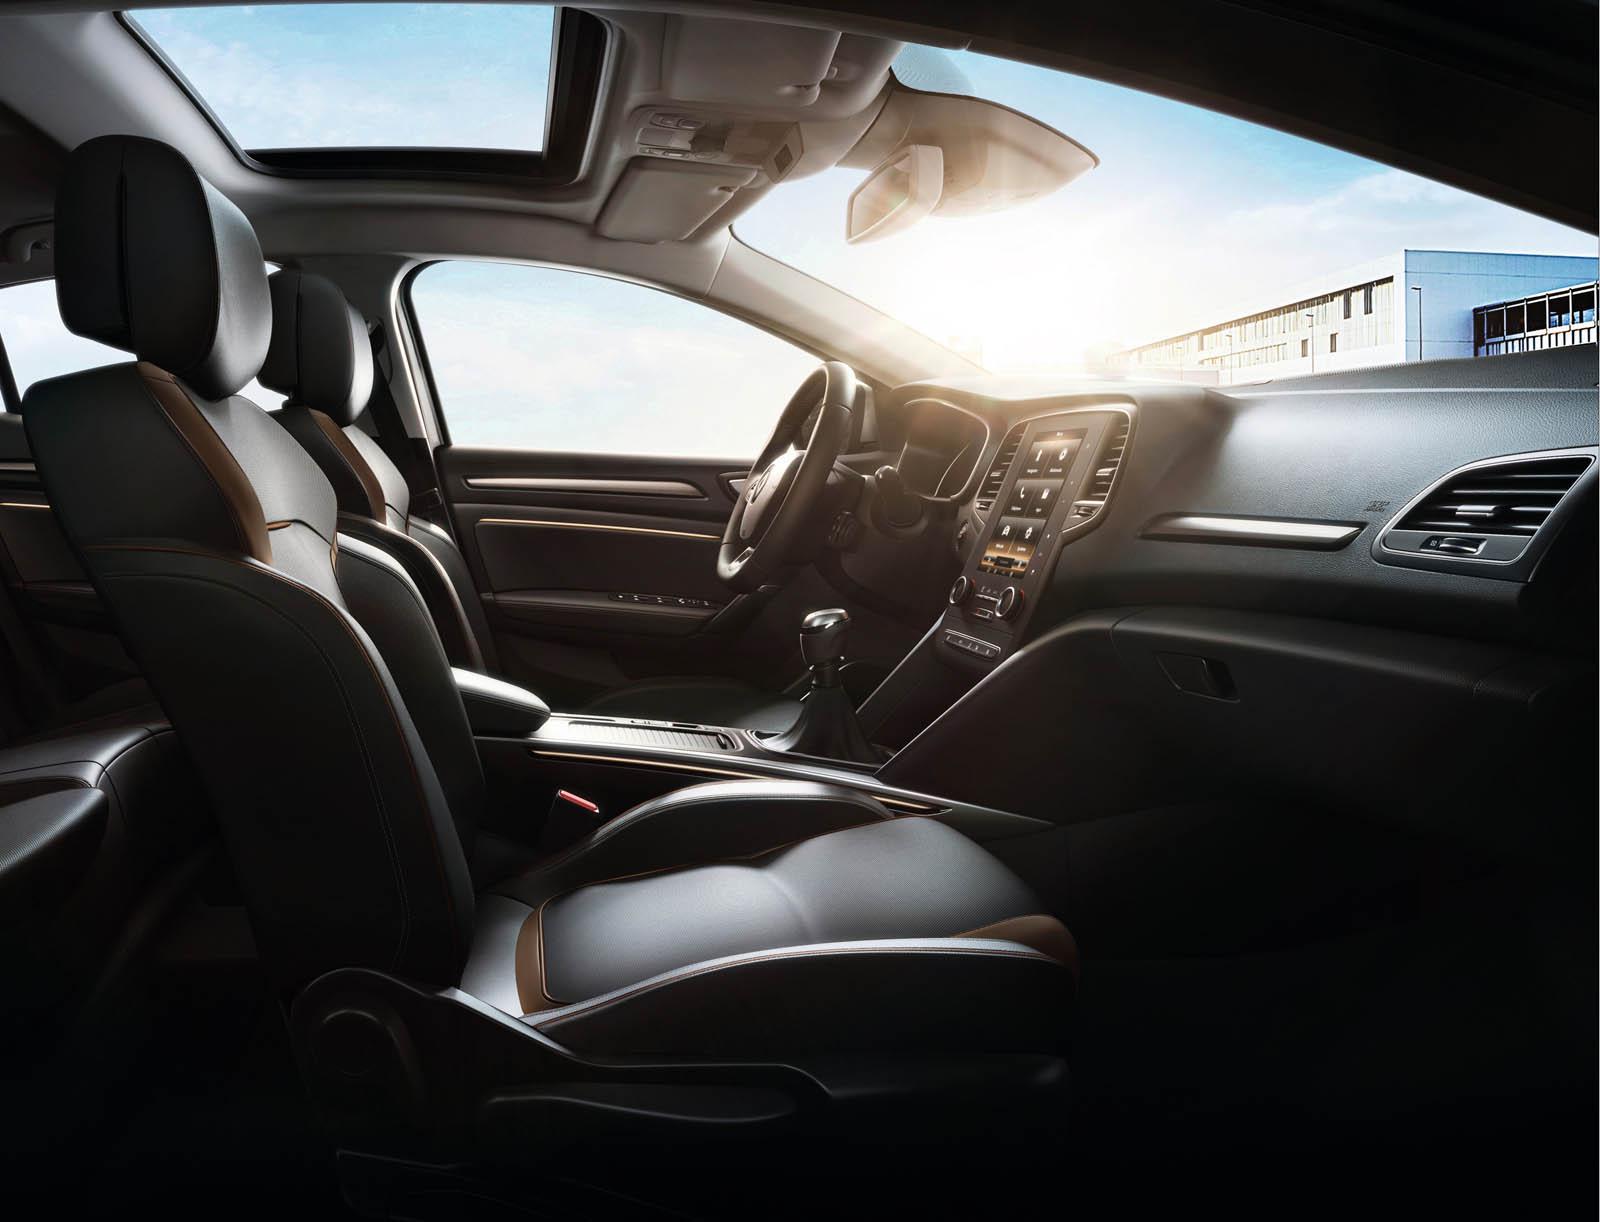 Renault Megane Akaju Edition (4)